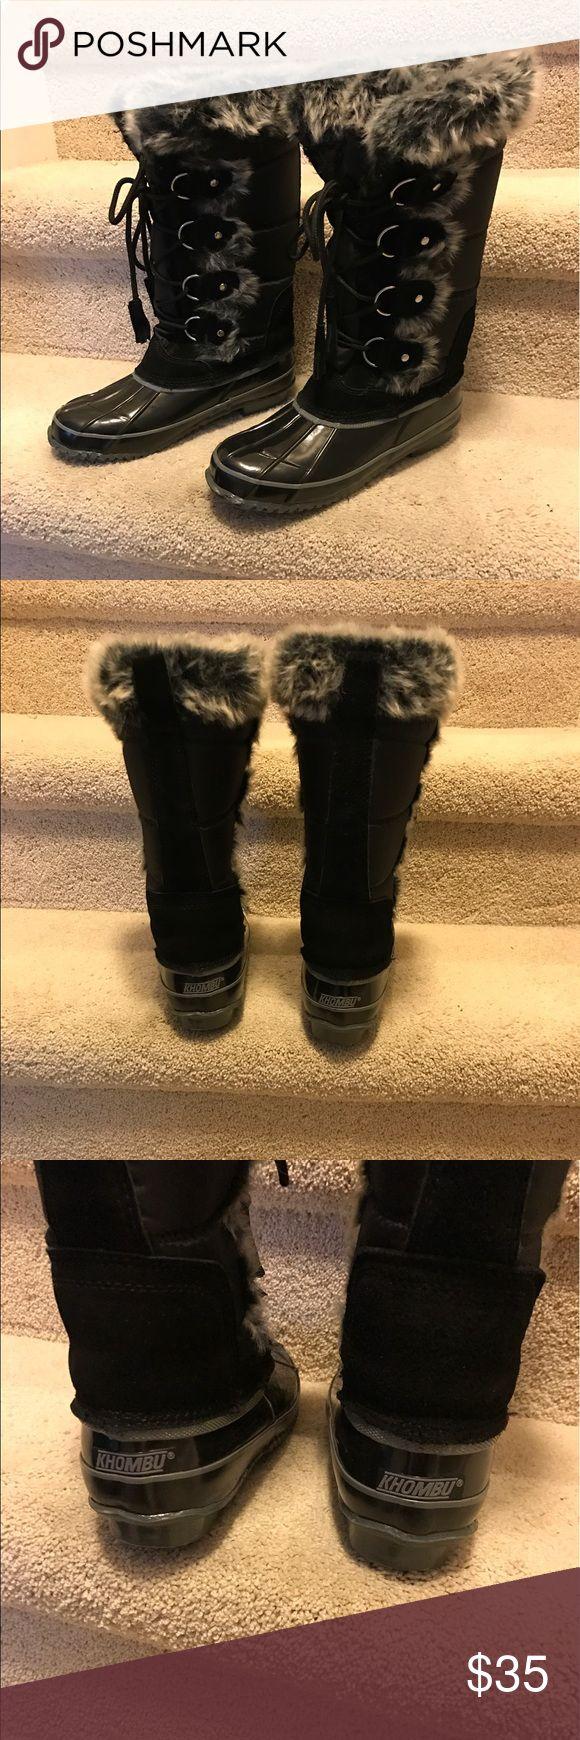 NWOT Khombu winter snow boots size 6 New without tag. Size 6. No box Khombu Shoes Winter & Rain Boots